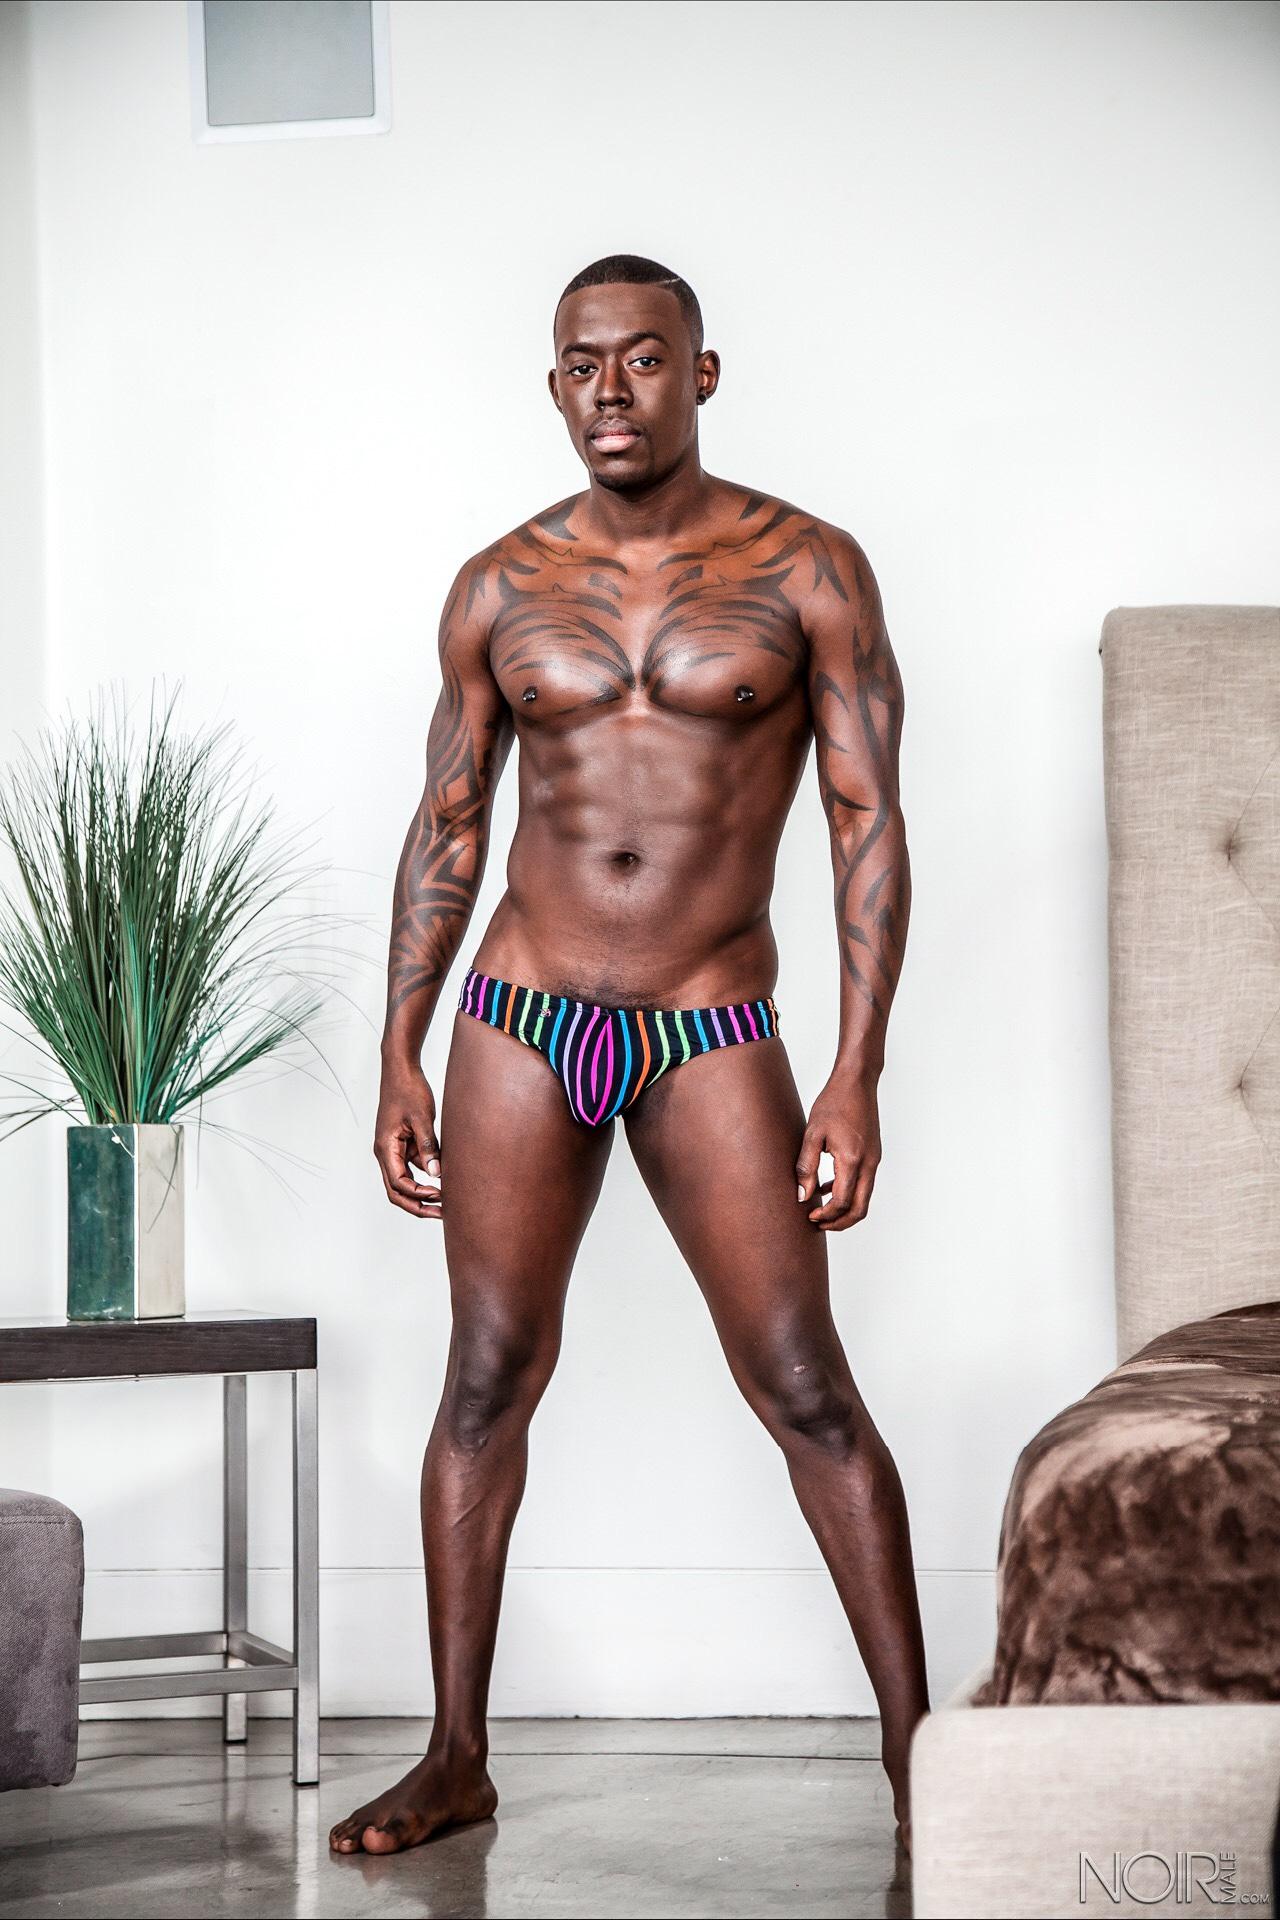 Avatar Gay Sex porn profiles: avatar akyia - means happy